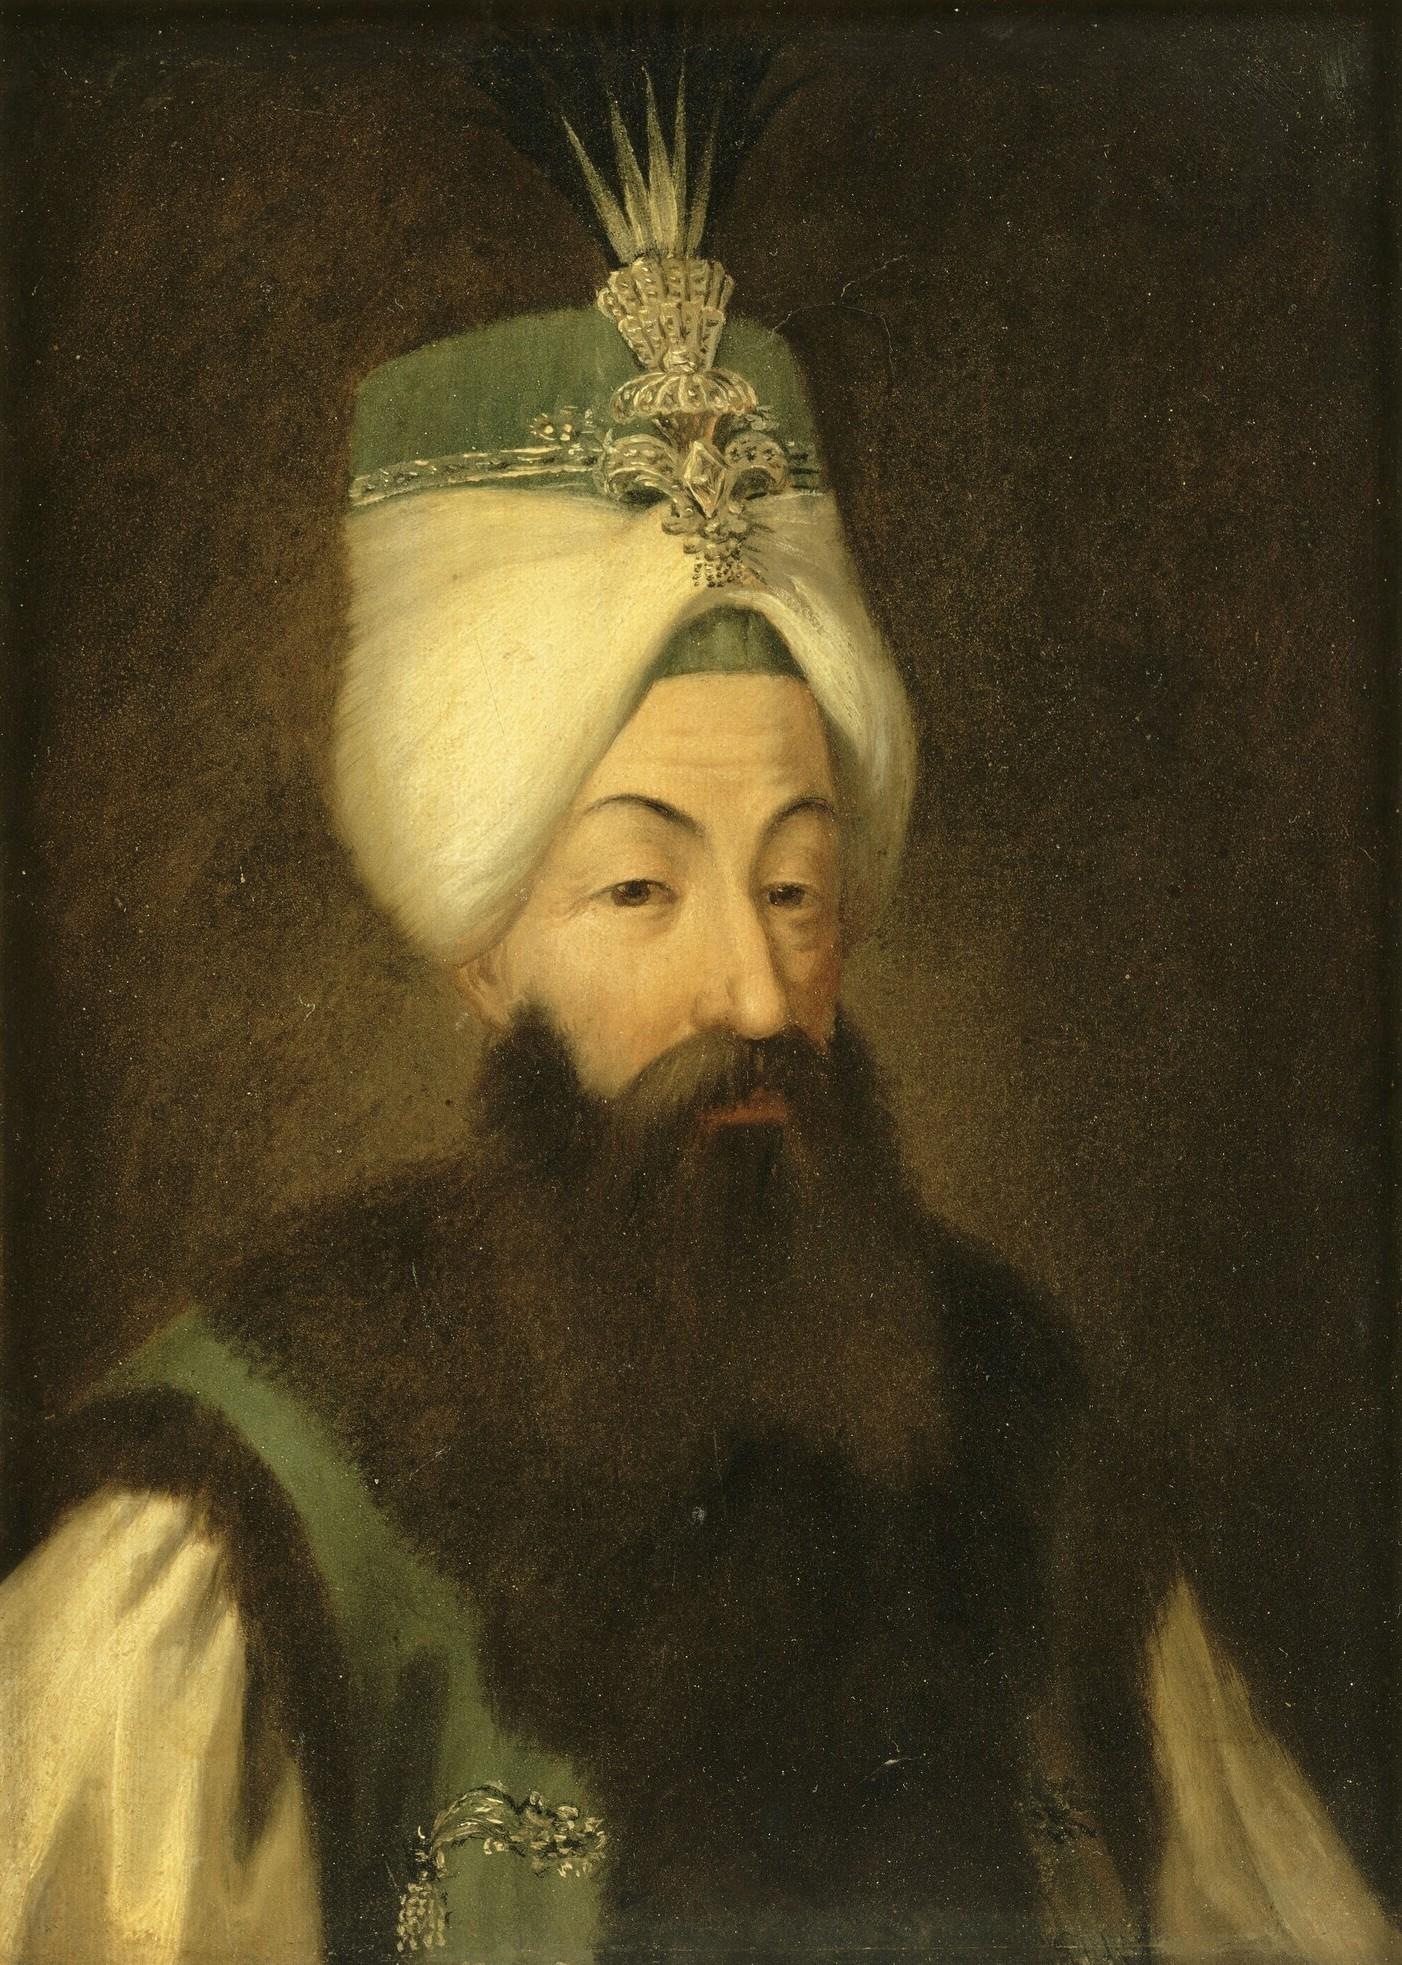 Depiction of Abd-ul-Hamid I